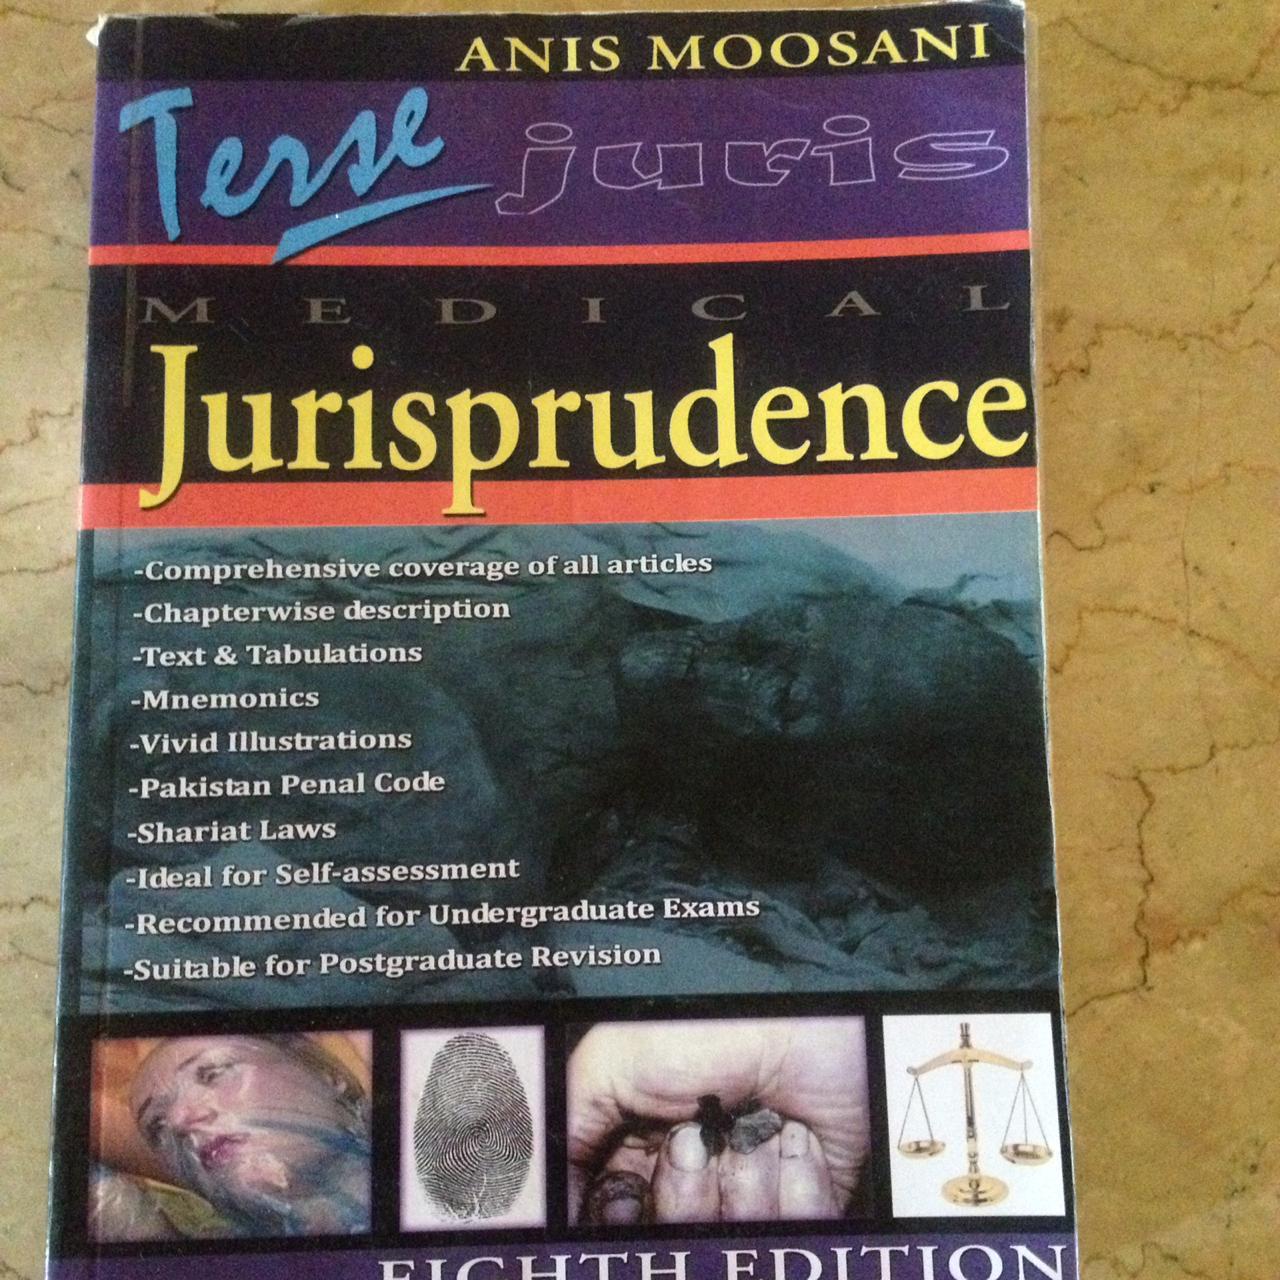 terse jurisprudence forensic medicine